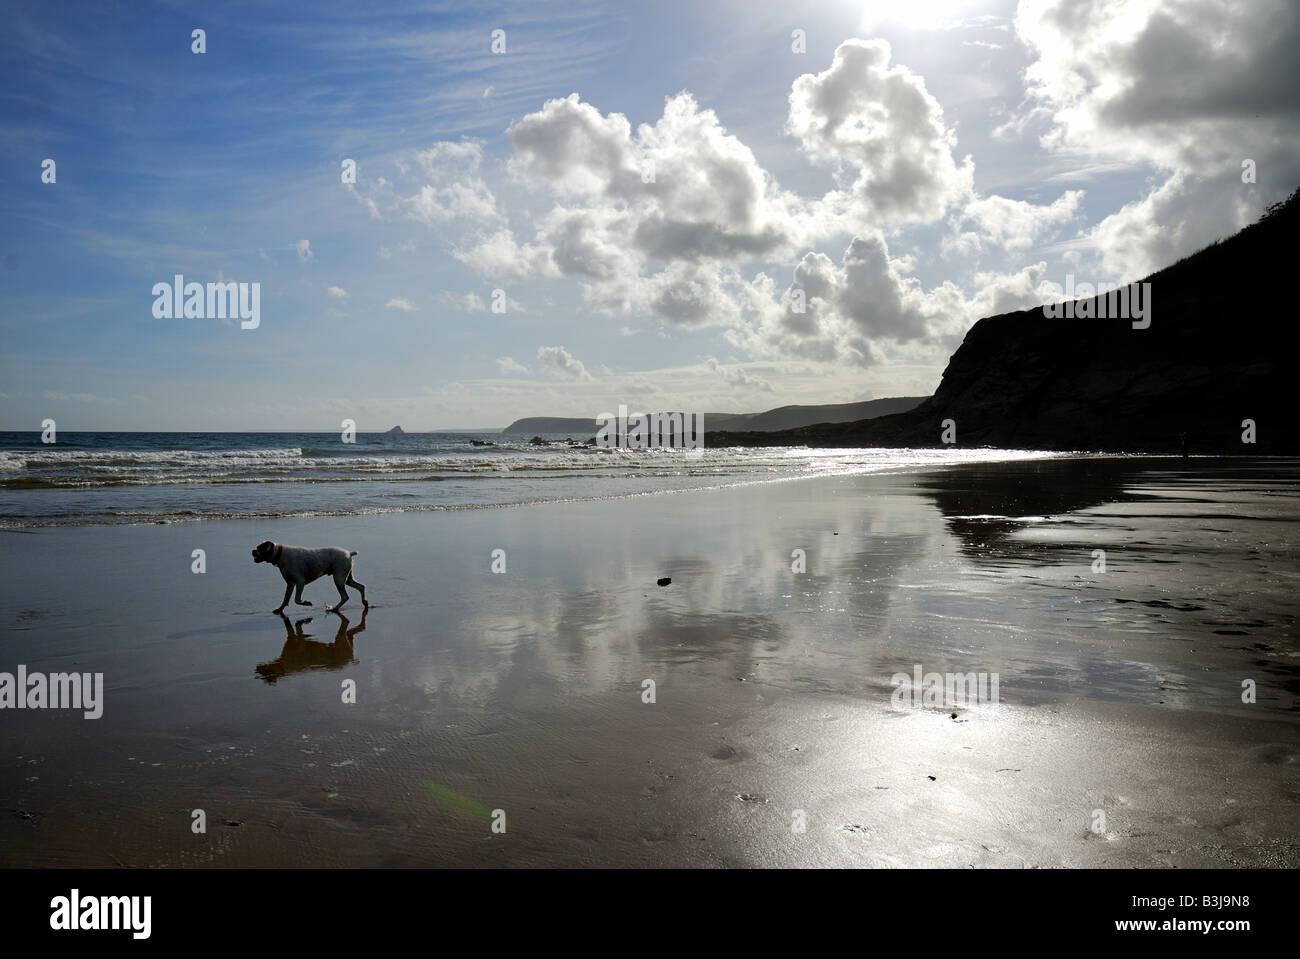 Dog on sandy beach in Cornwall - Stock Image